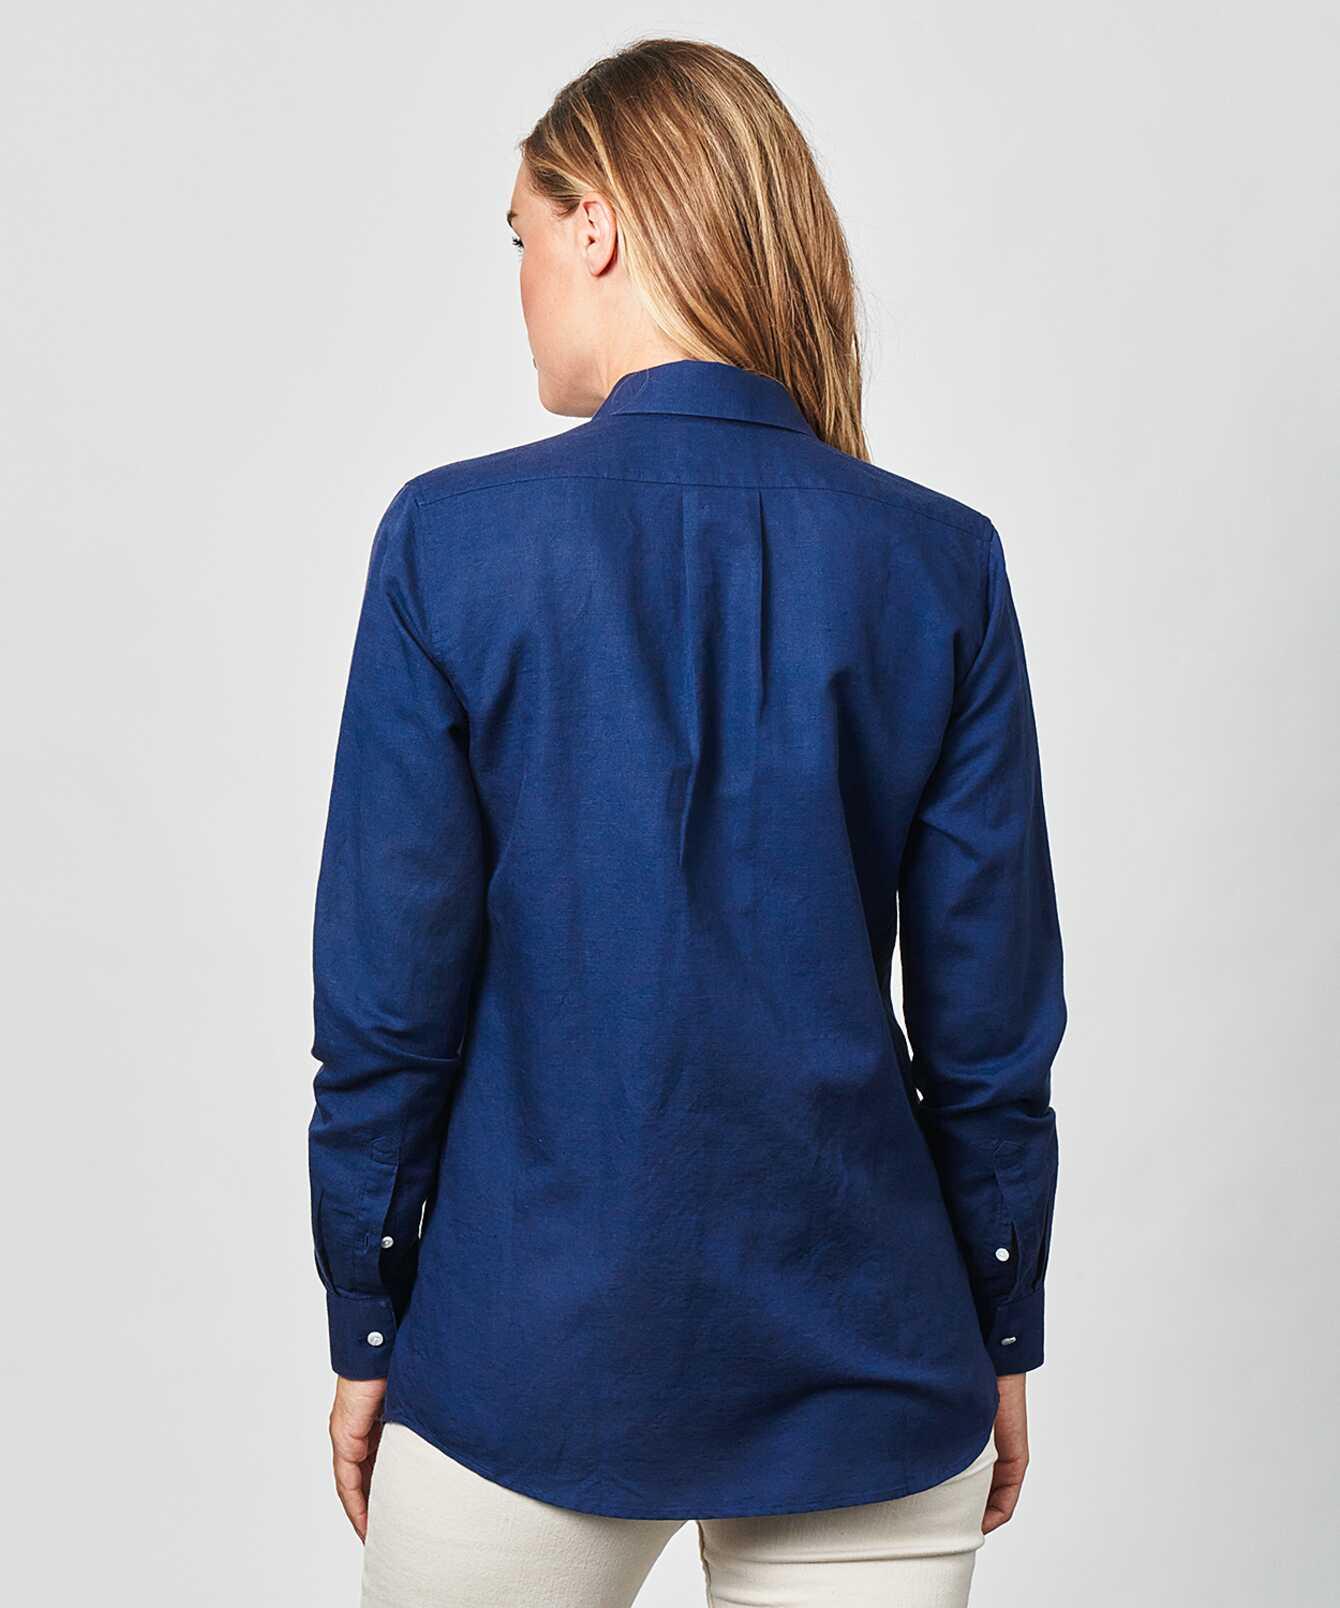 Shirt Mickan Portofino Blue The Shirt Factory